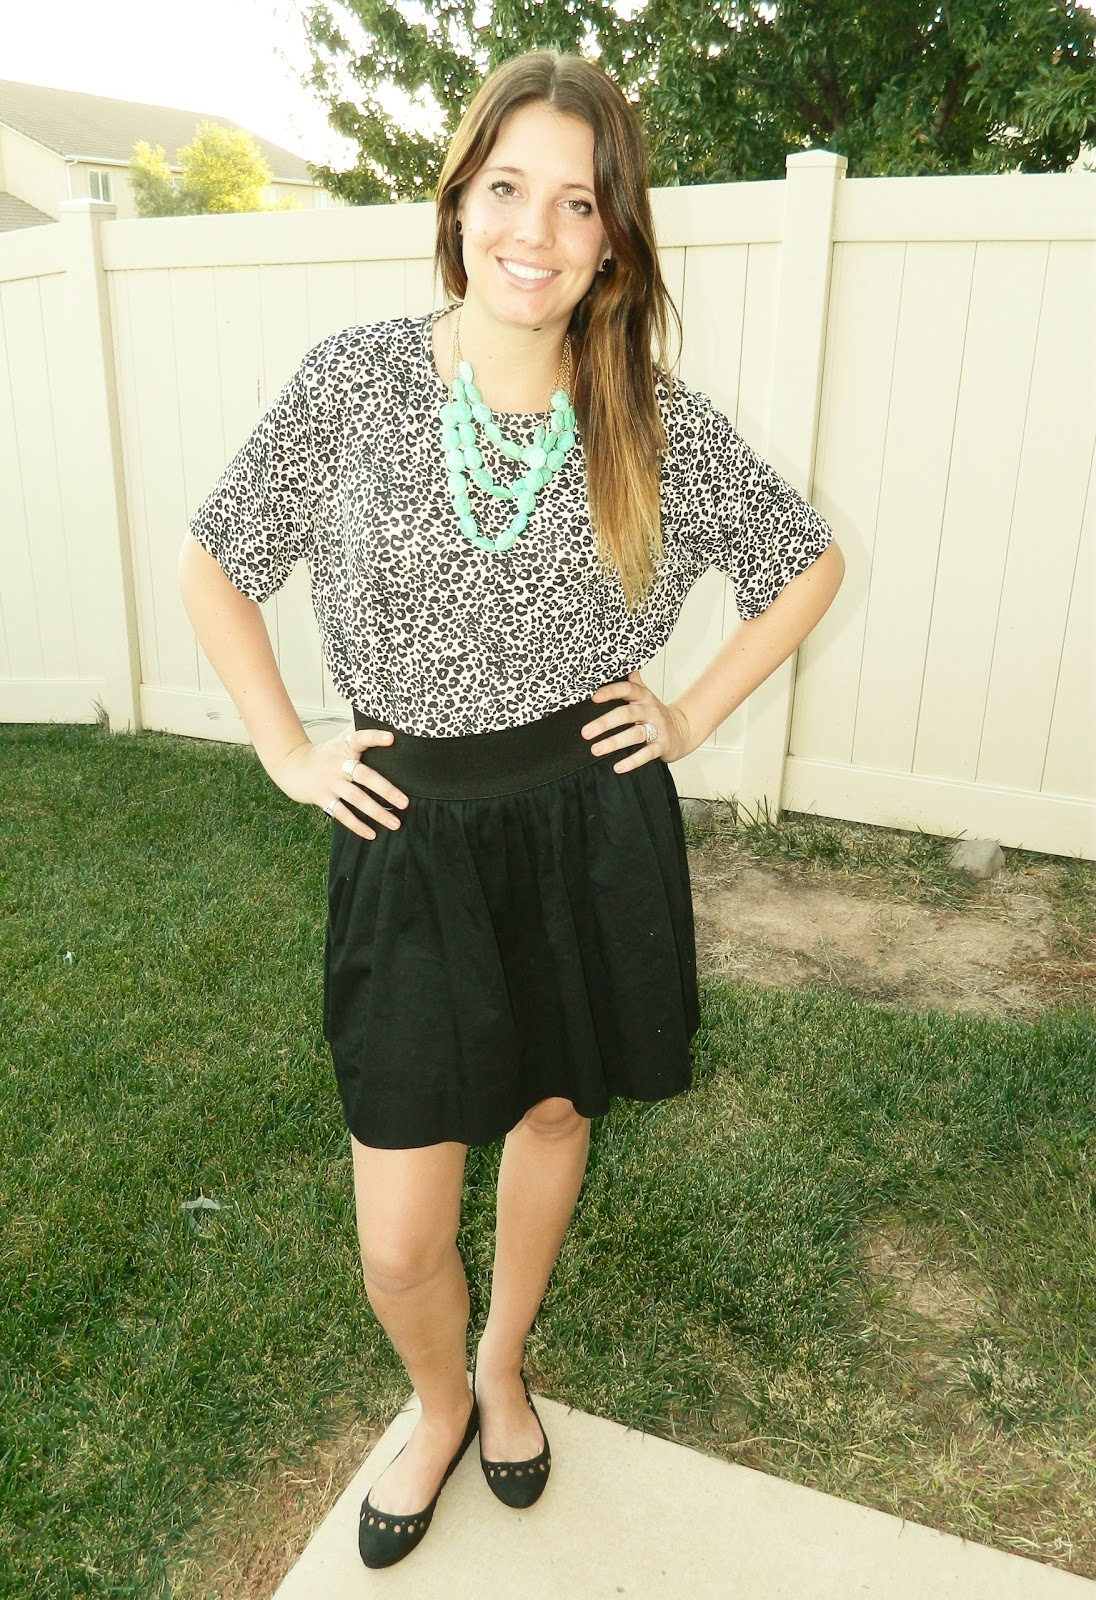 Utah Fashion blogger, modest fashion blogger, animal print, black skirt